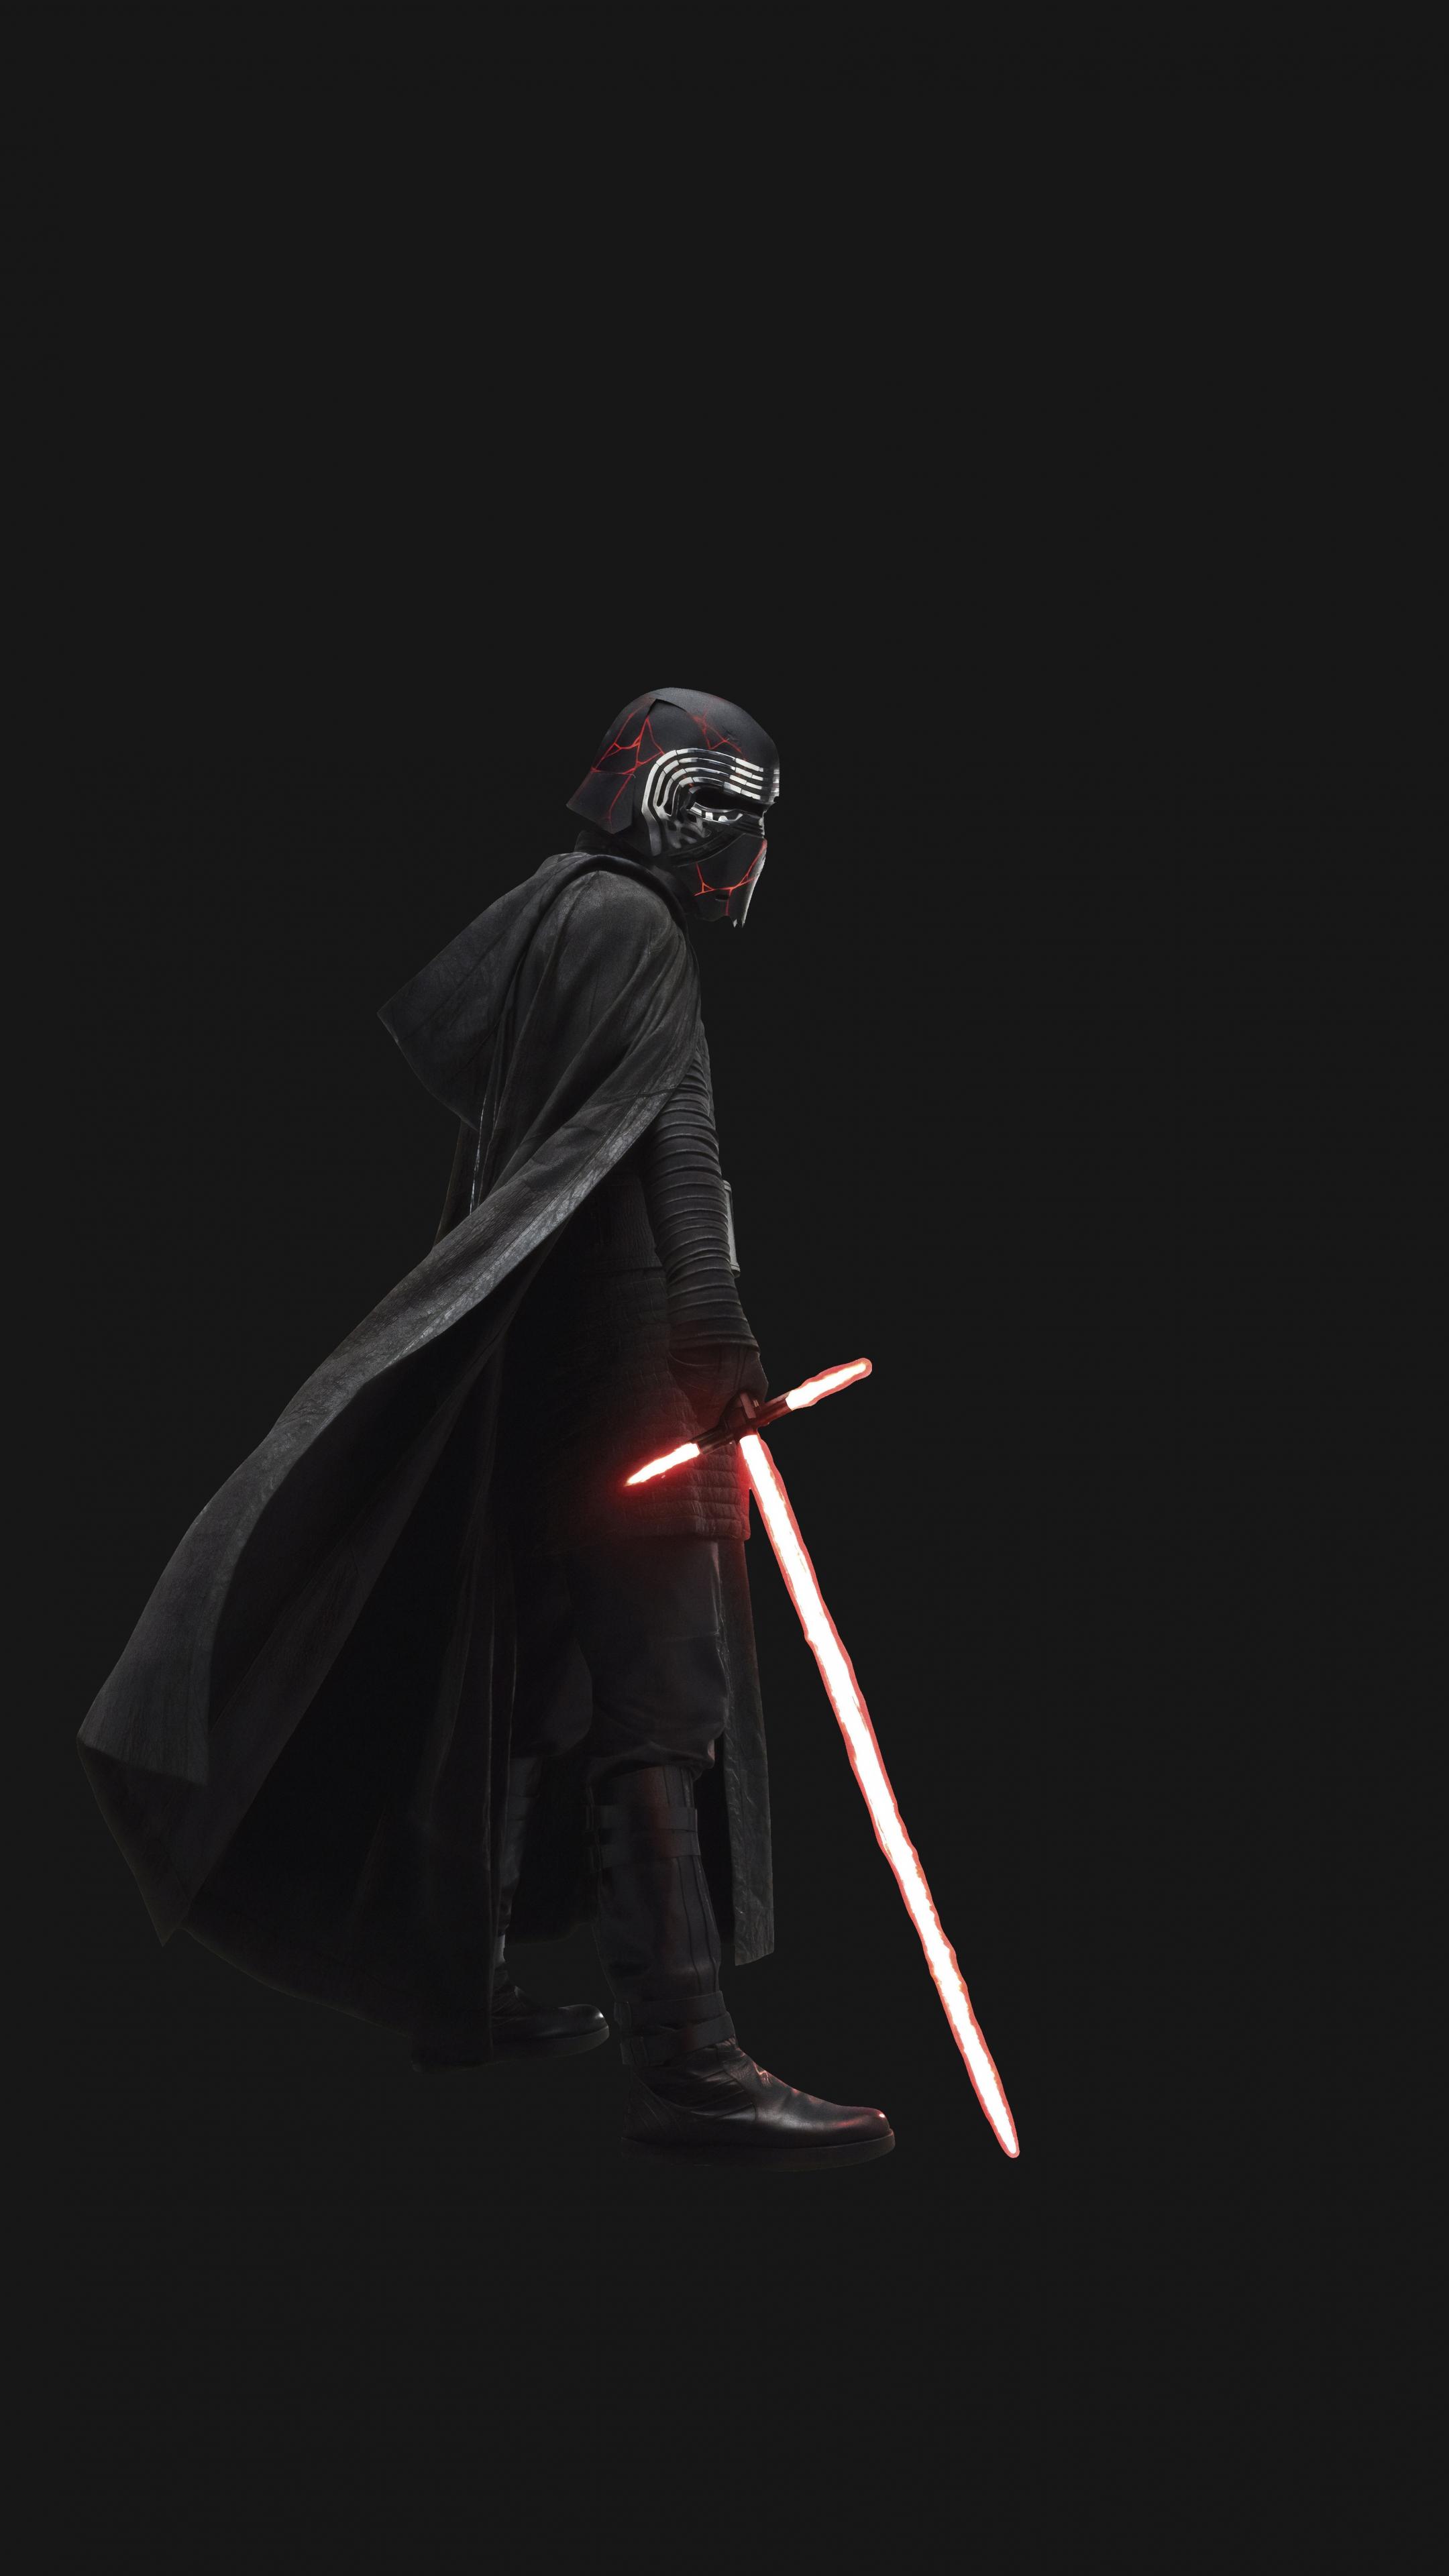 Download 2160x3840 Wallpaper Star Wars The Rise Of Skywalker